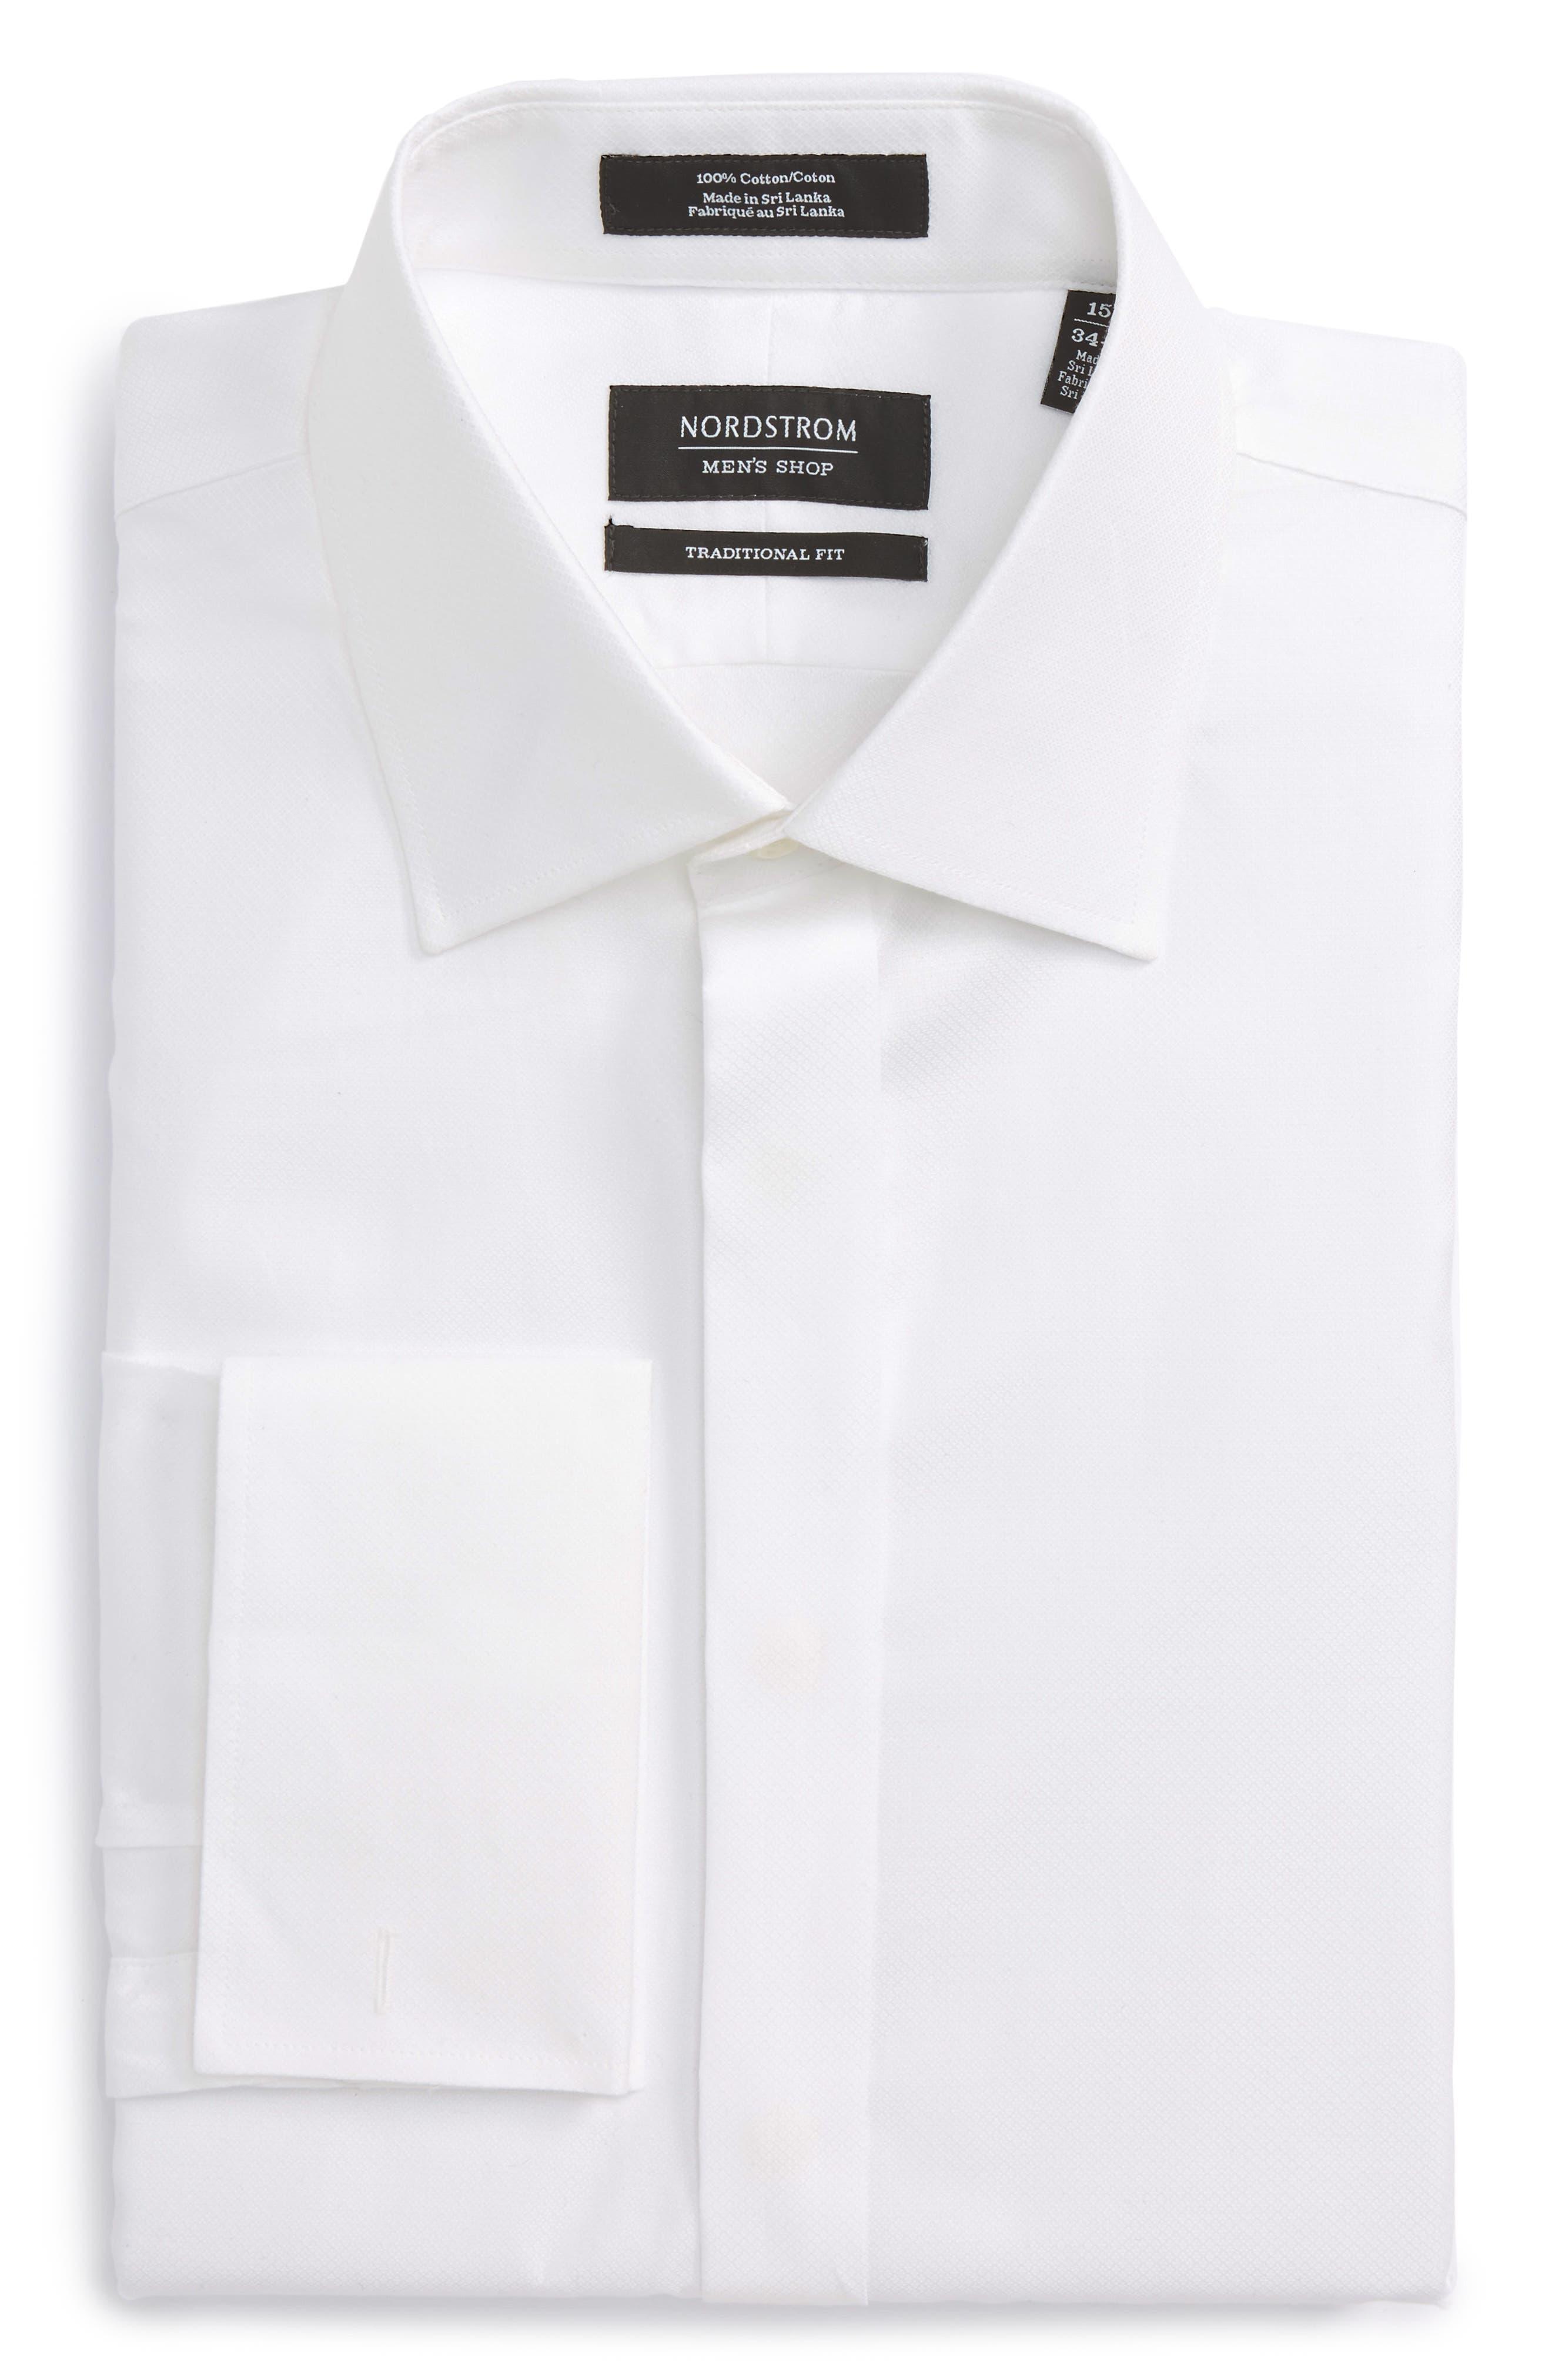 Main Image - Nordstrom Men's Shop Traditional Fit Tuxedo Shirt